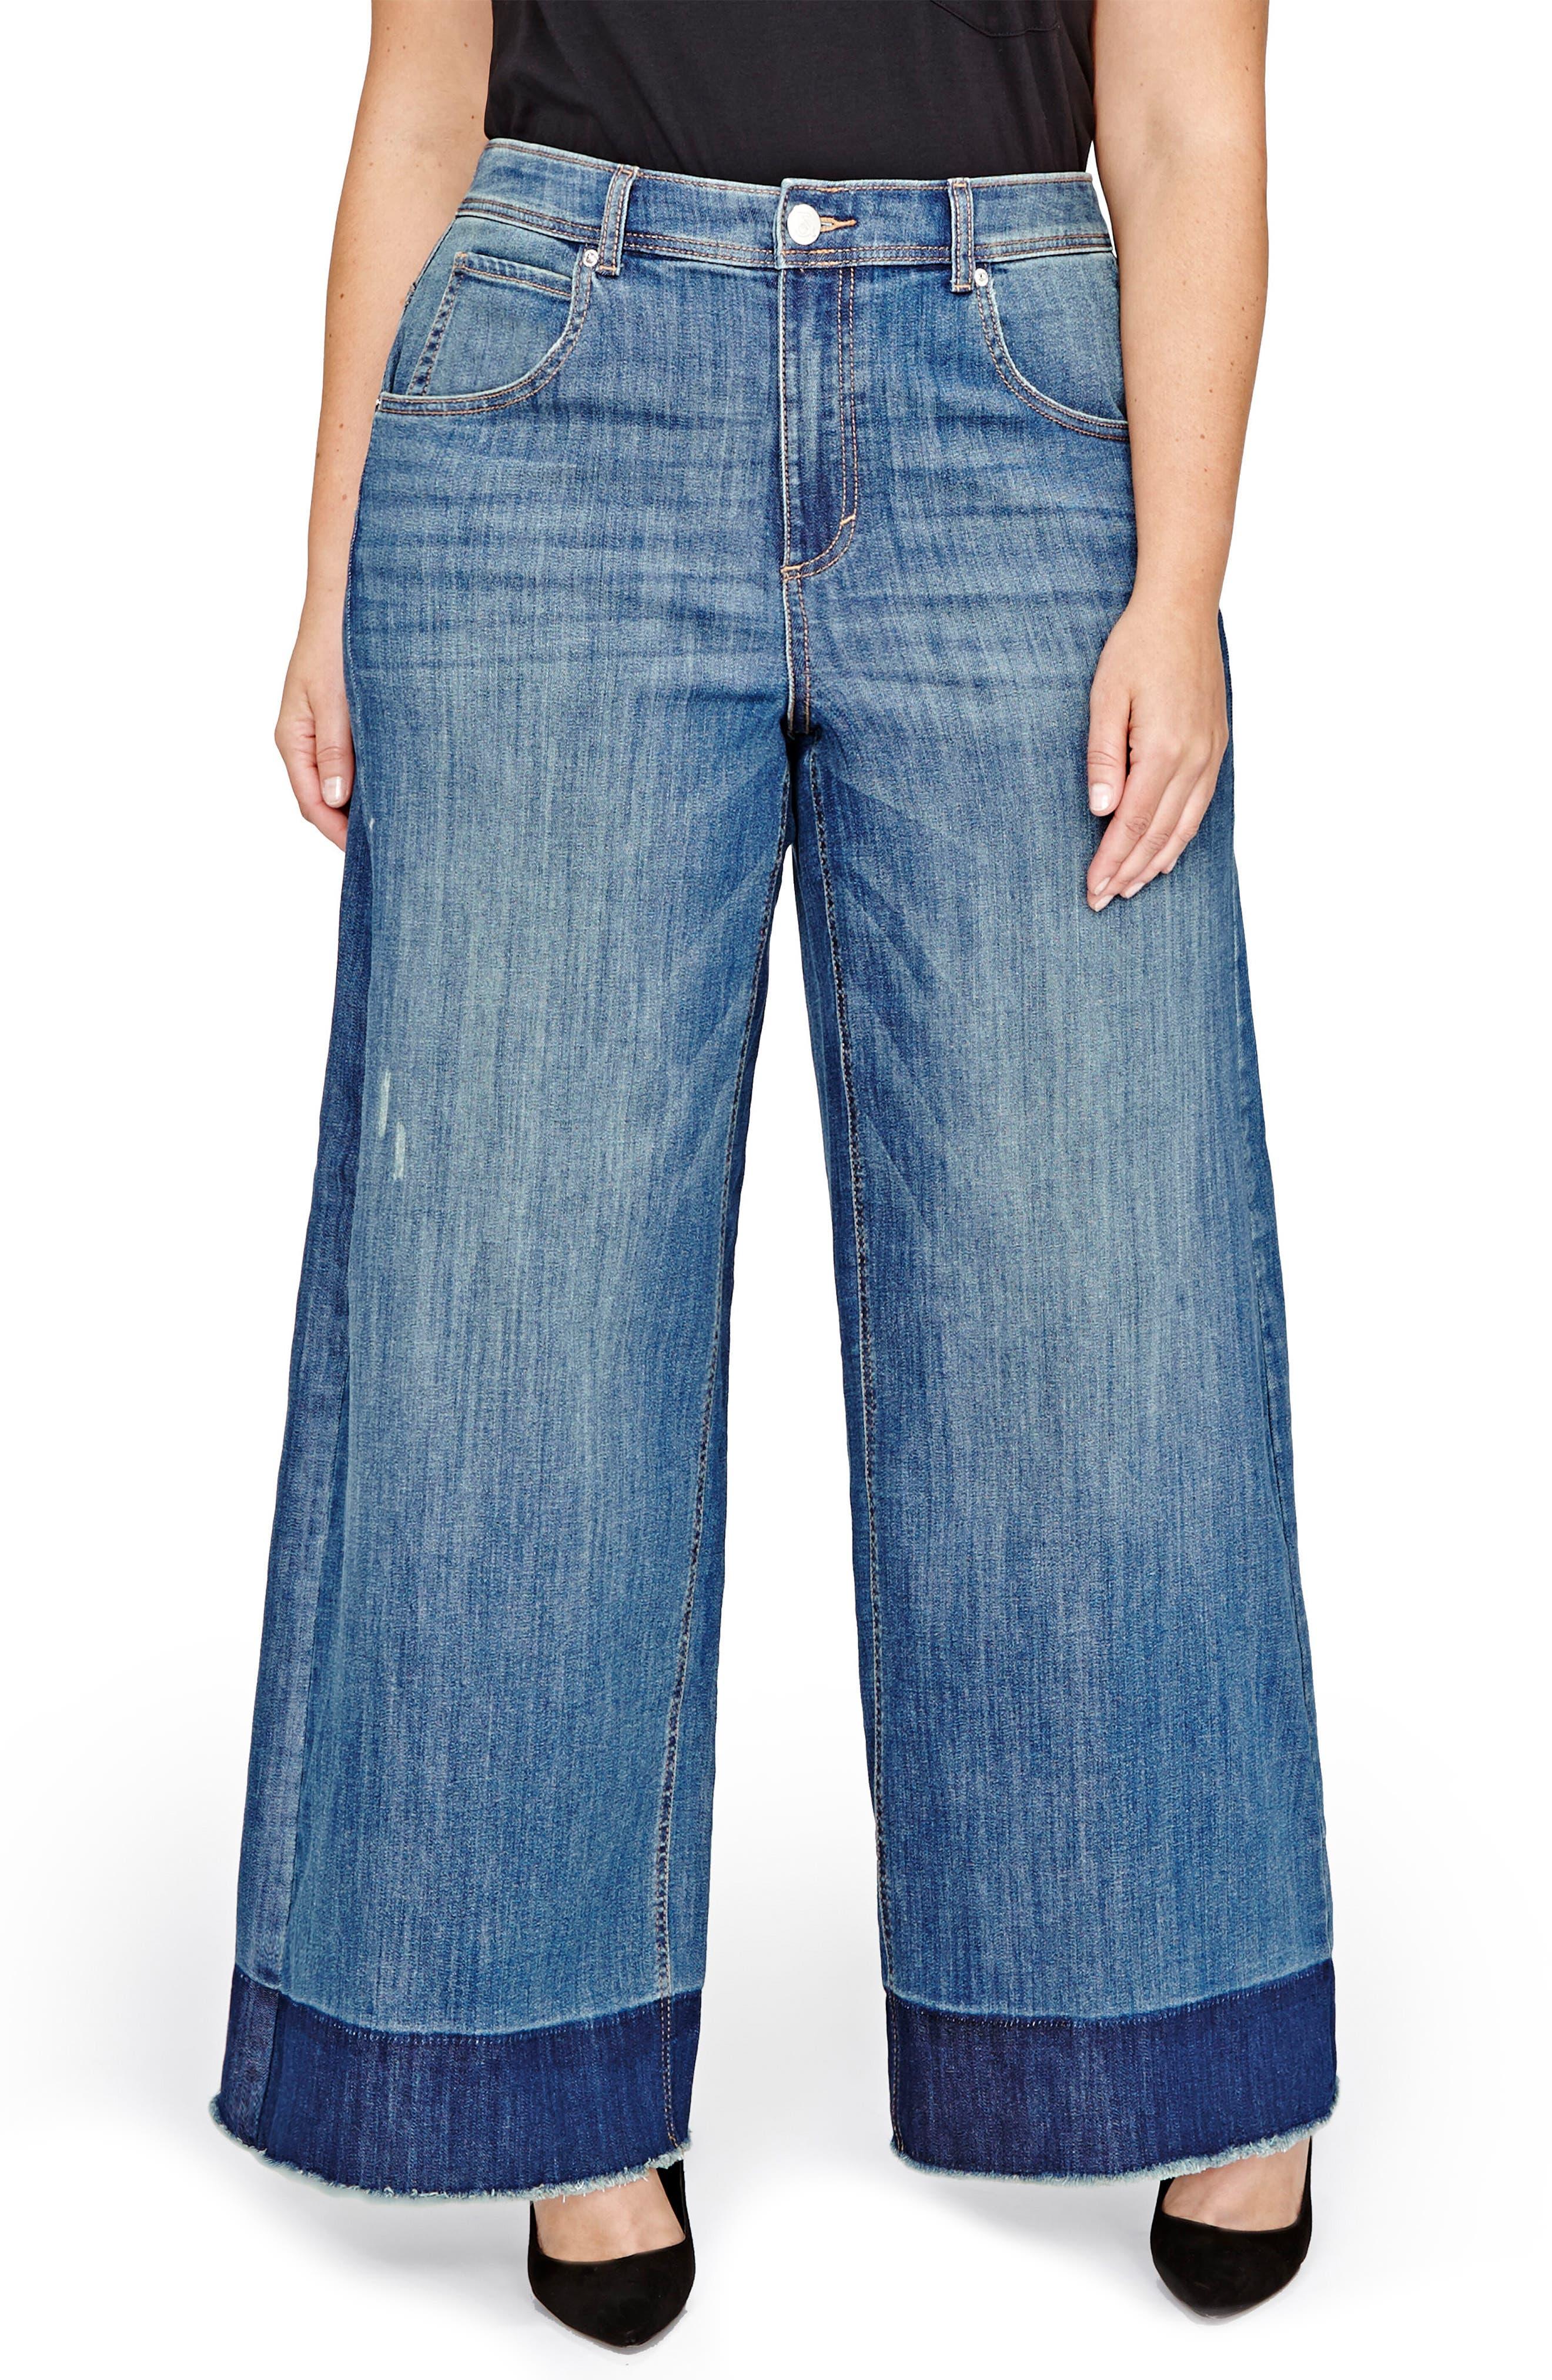 Main Image - ADDITION ELLE LOVE AND LEGEND Jordyn Woods High Waist Wide Leg Jeans (Plus Size)